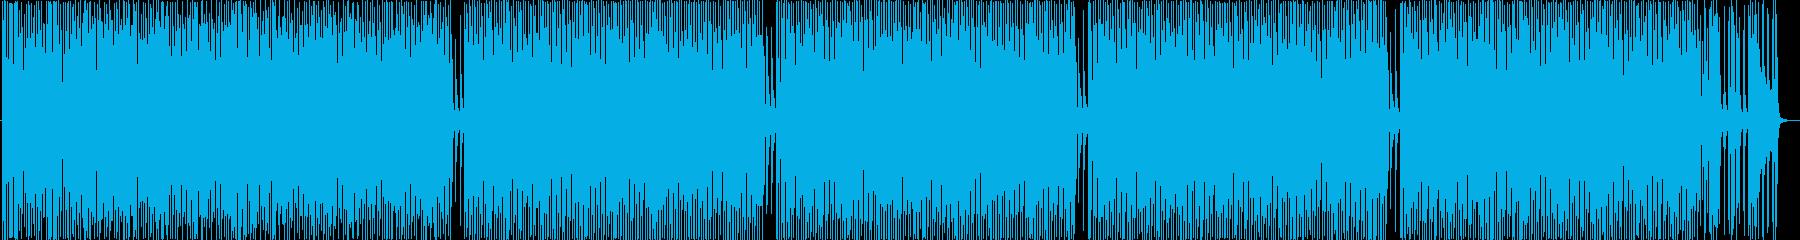 CMやオープニング等_カントリー風BGMの再生済みの波形